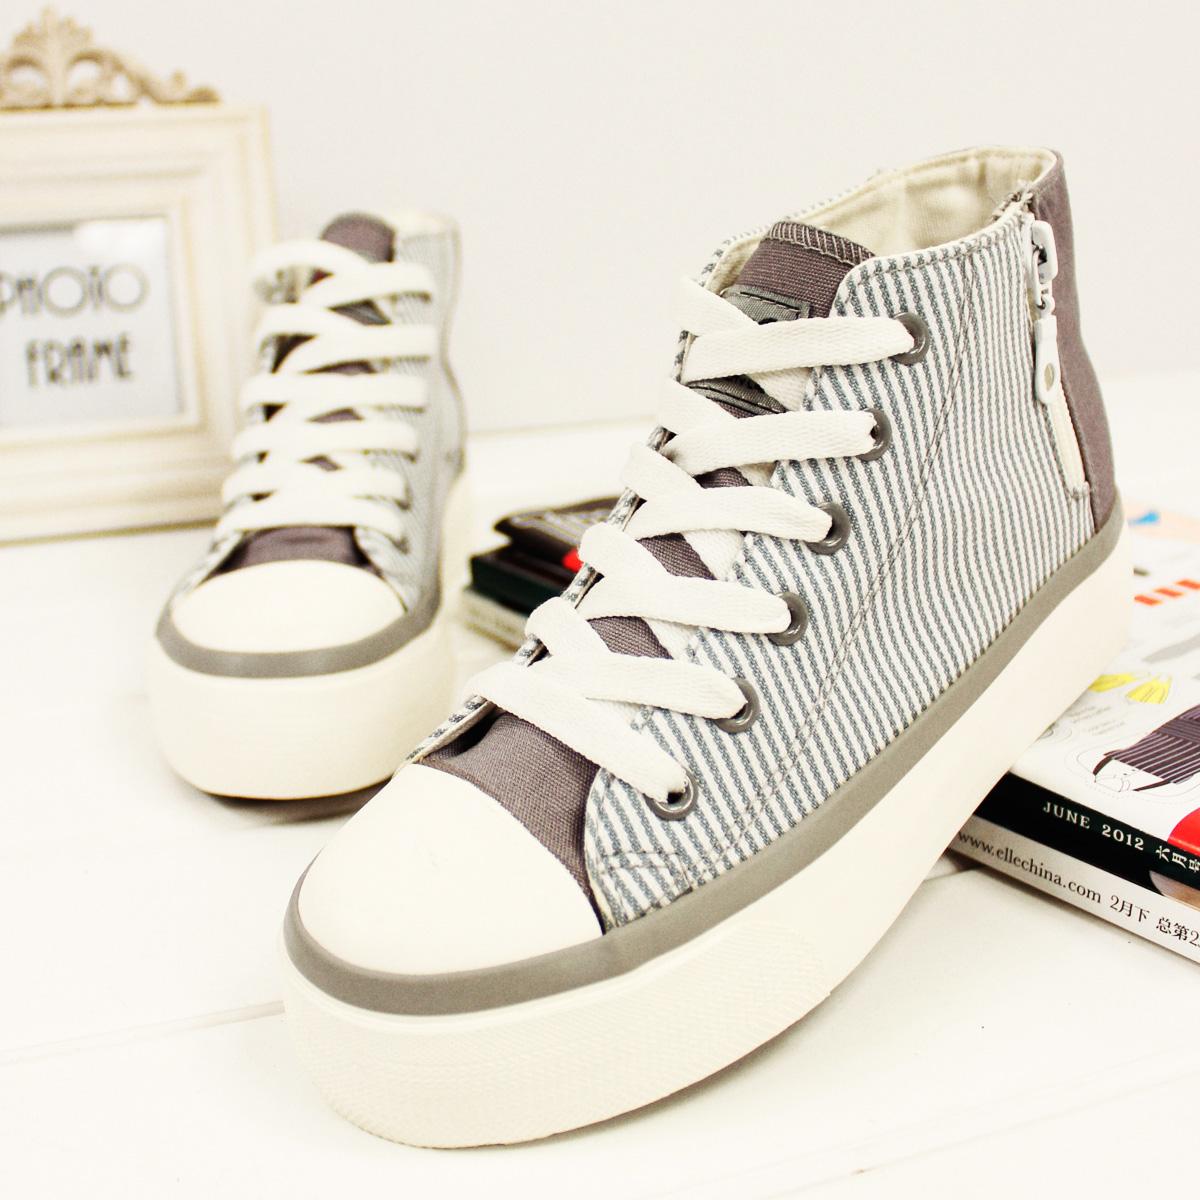 Attitude fashion stripe lacing zipper high platform canvas shoes women's shoes(China (Mainland))